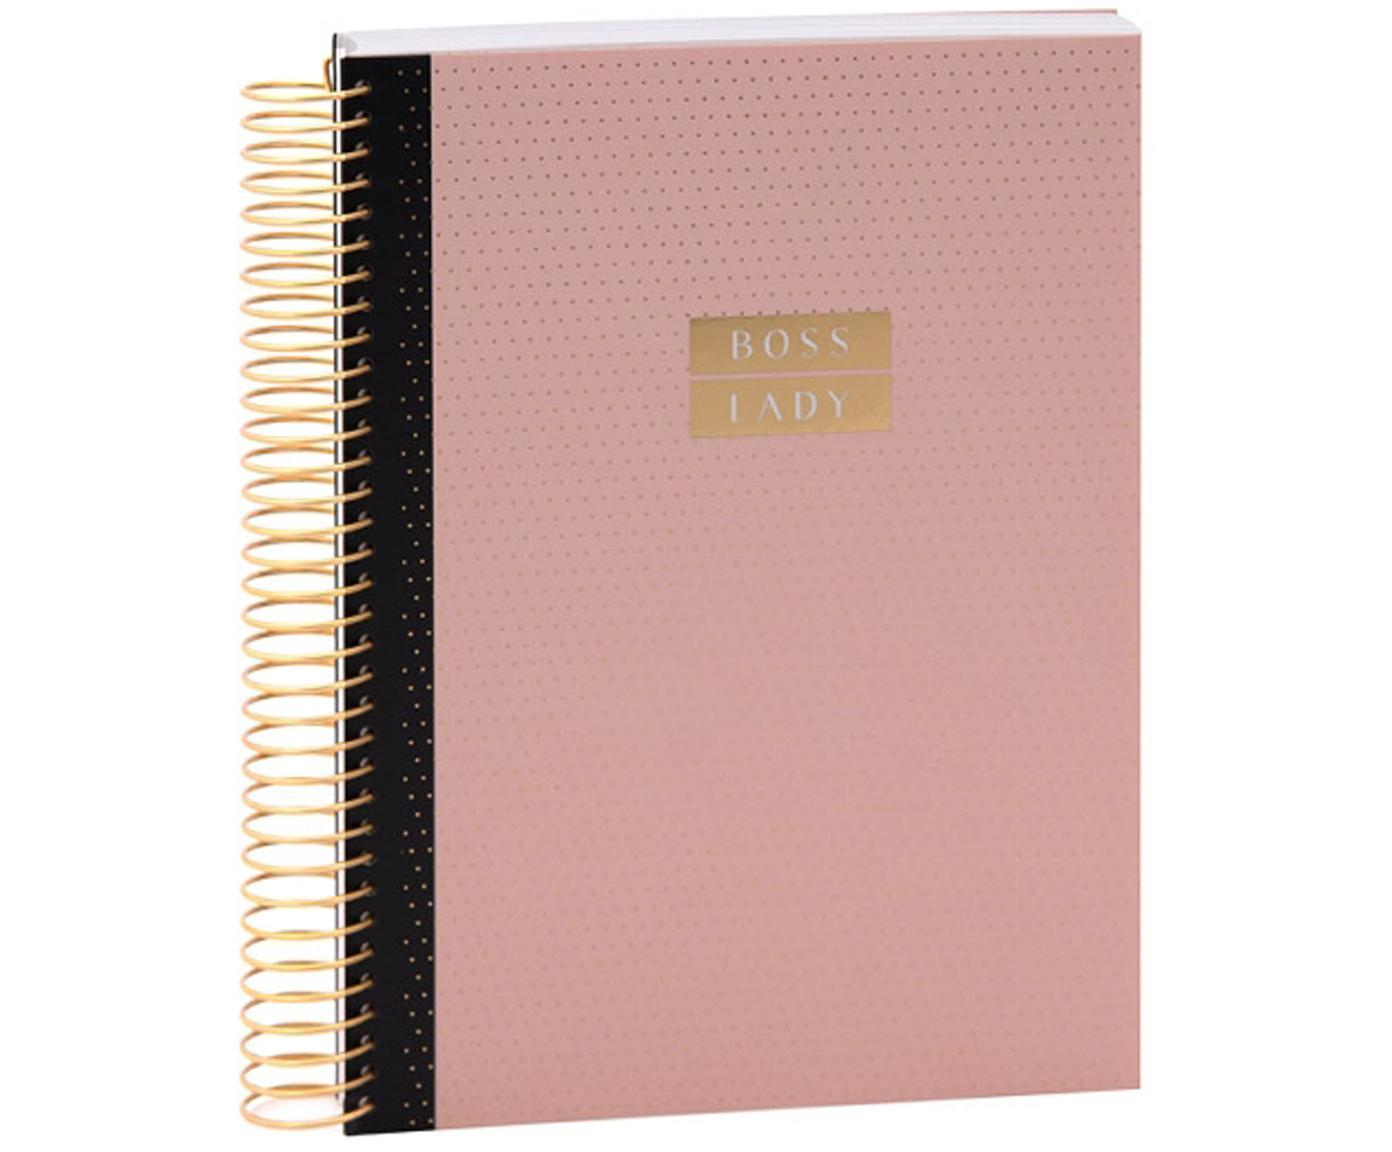 Quaderno a spirale Boss Lady, Rosa, dorato, Larg. 21 x Alt. 15 cm